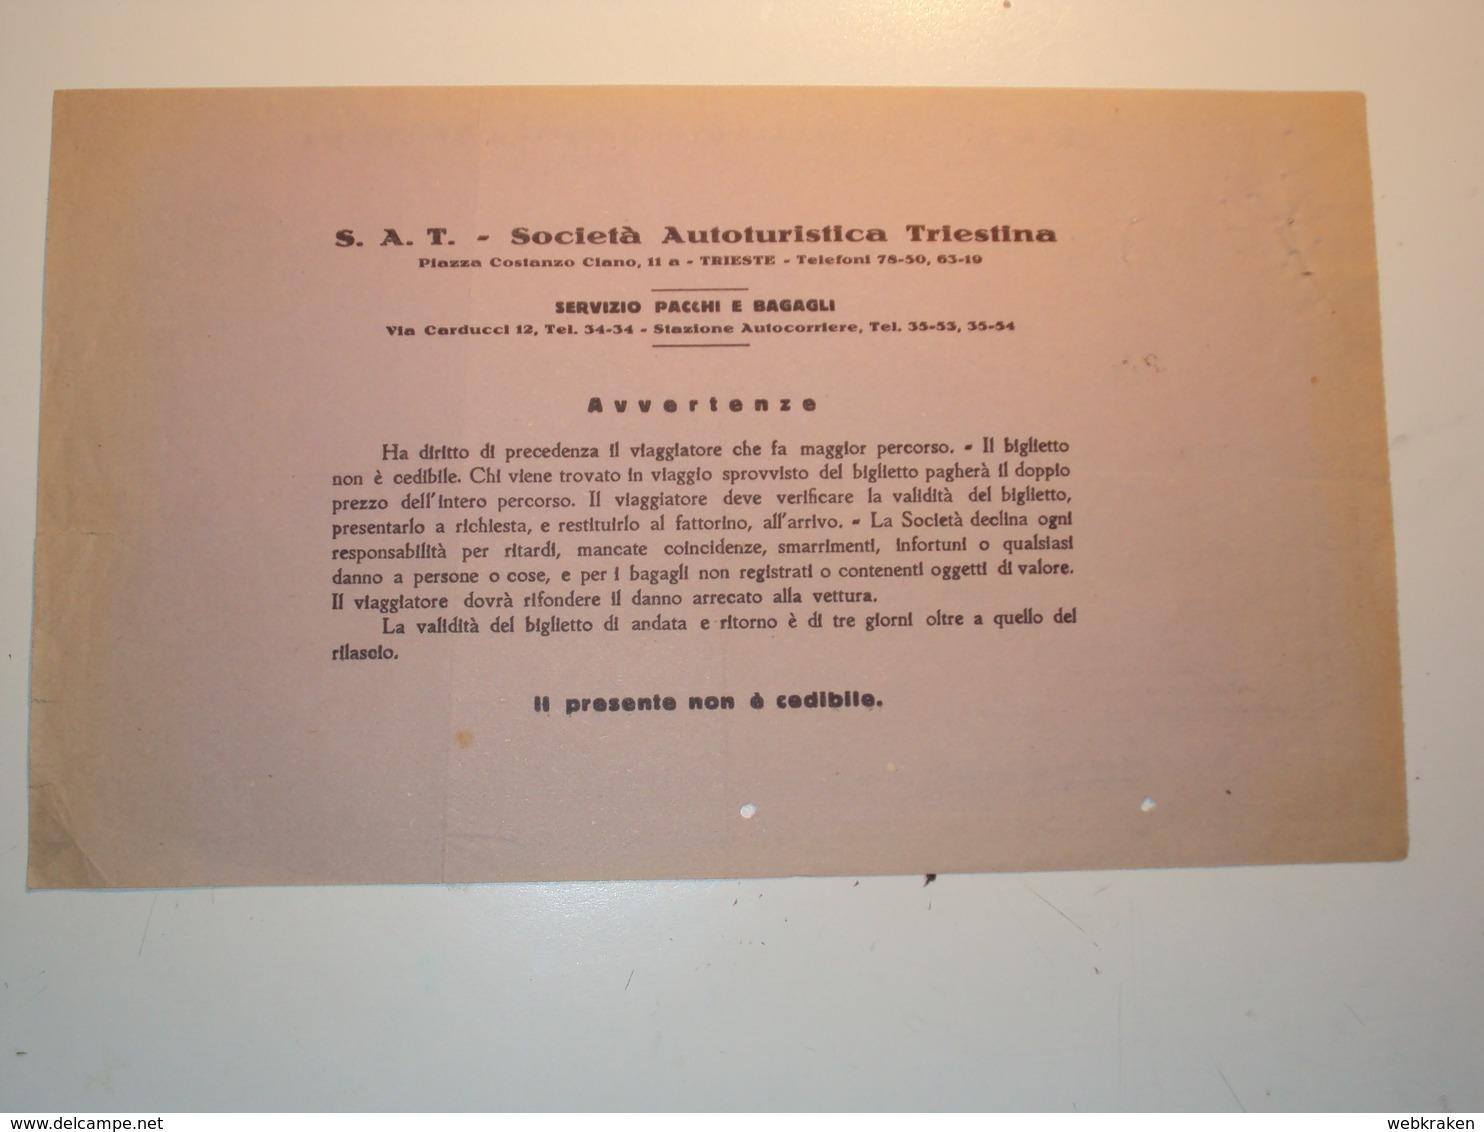 ITALIA TRIESTE BIGLIETTO DI AUTOBUS SOCIETà AUTOTURISTICA TRIESTINA OCCUPAZIONE TEDESCA 1944 PROVINZ FRIAUL FRIULI - Historical Documents